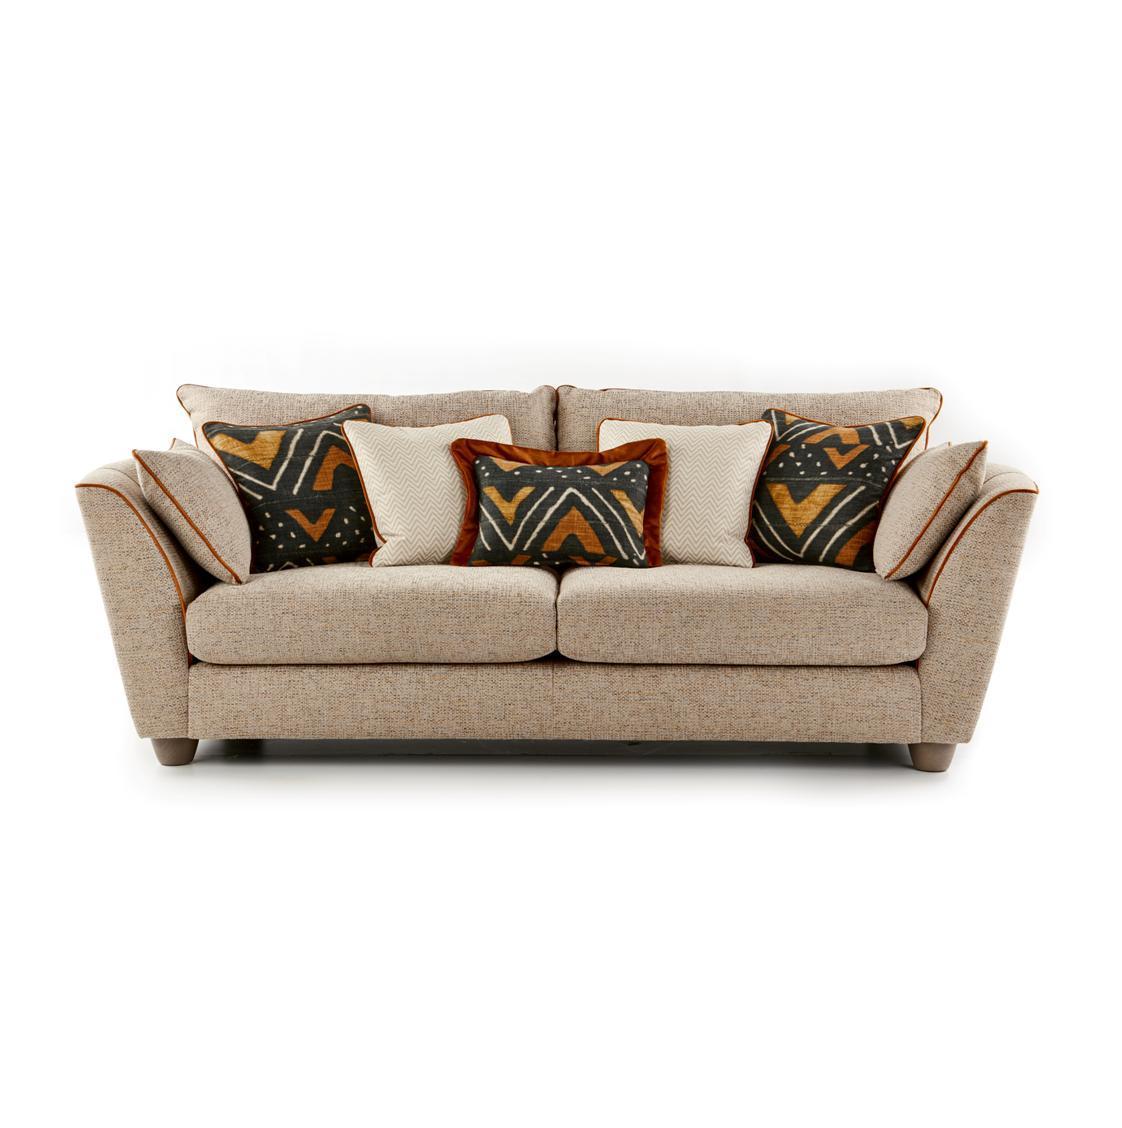 Odin 3 Seater Sofa - M Burrows Furniture World